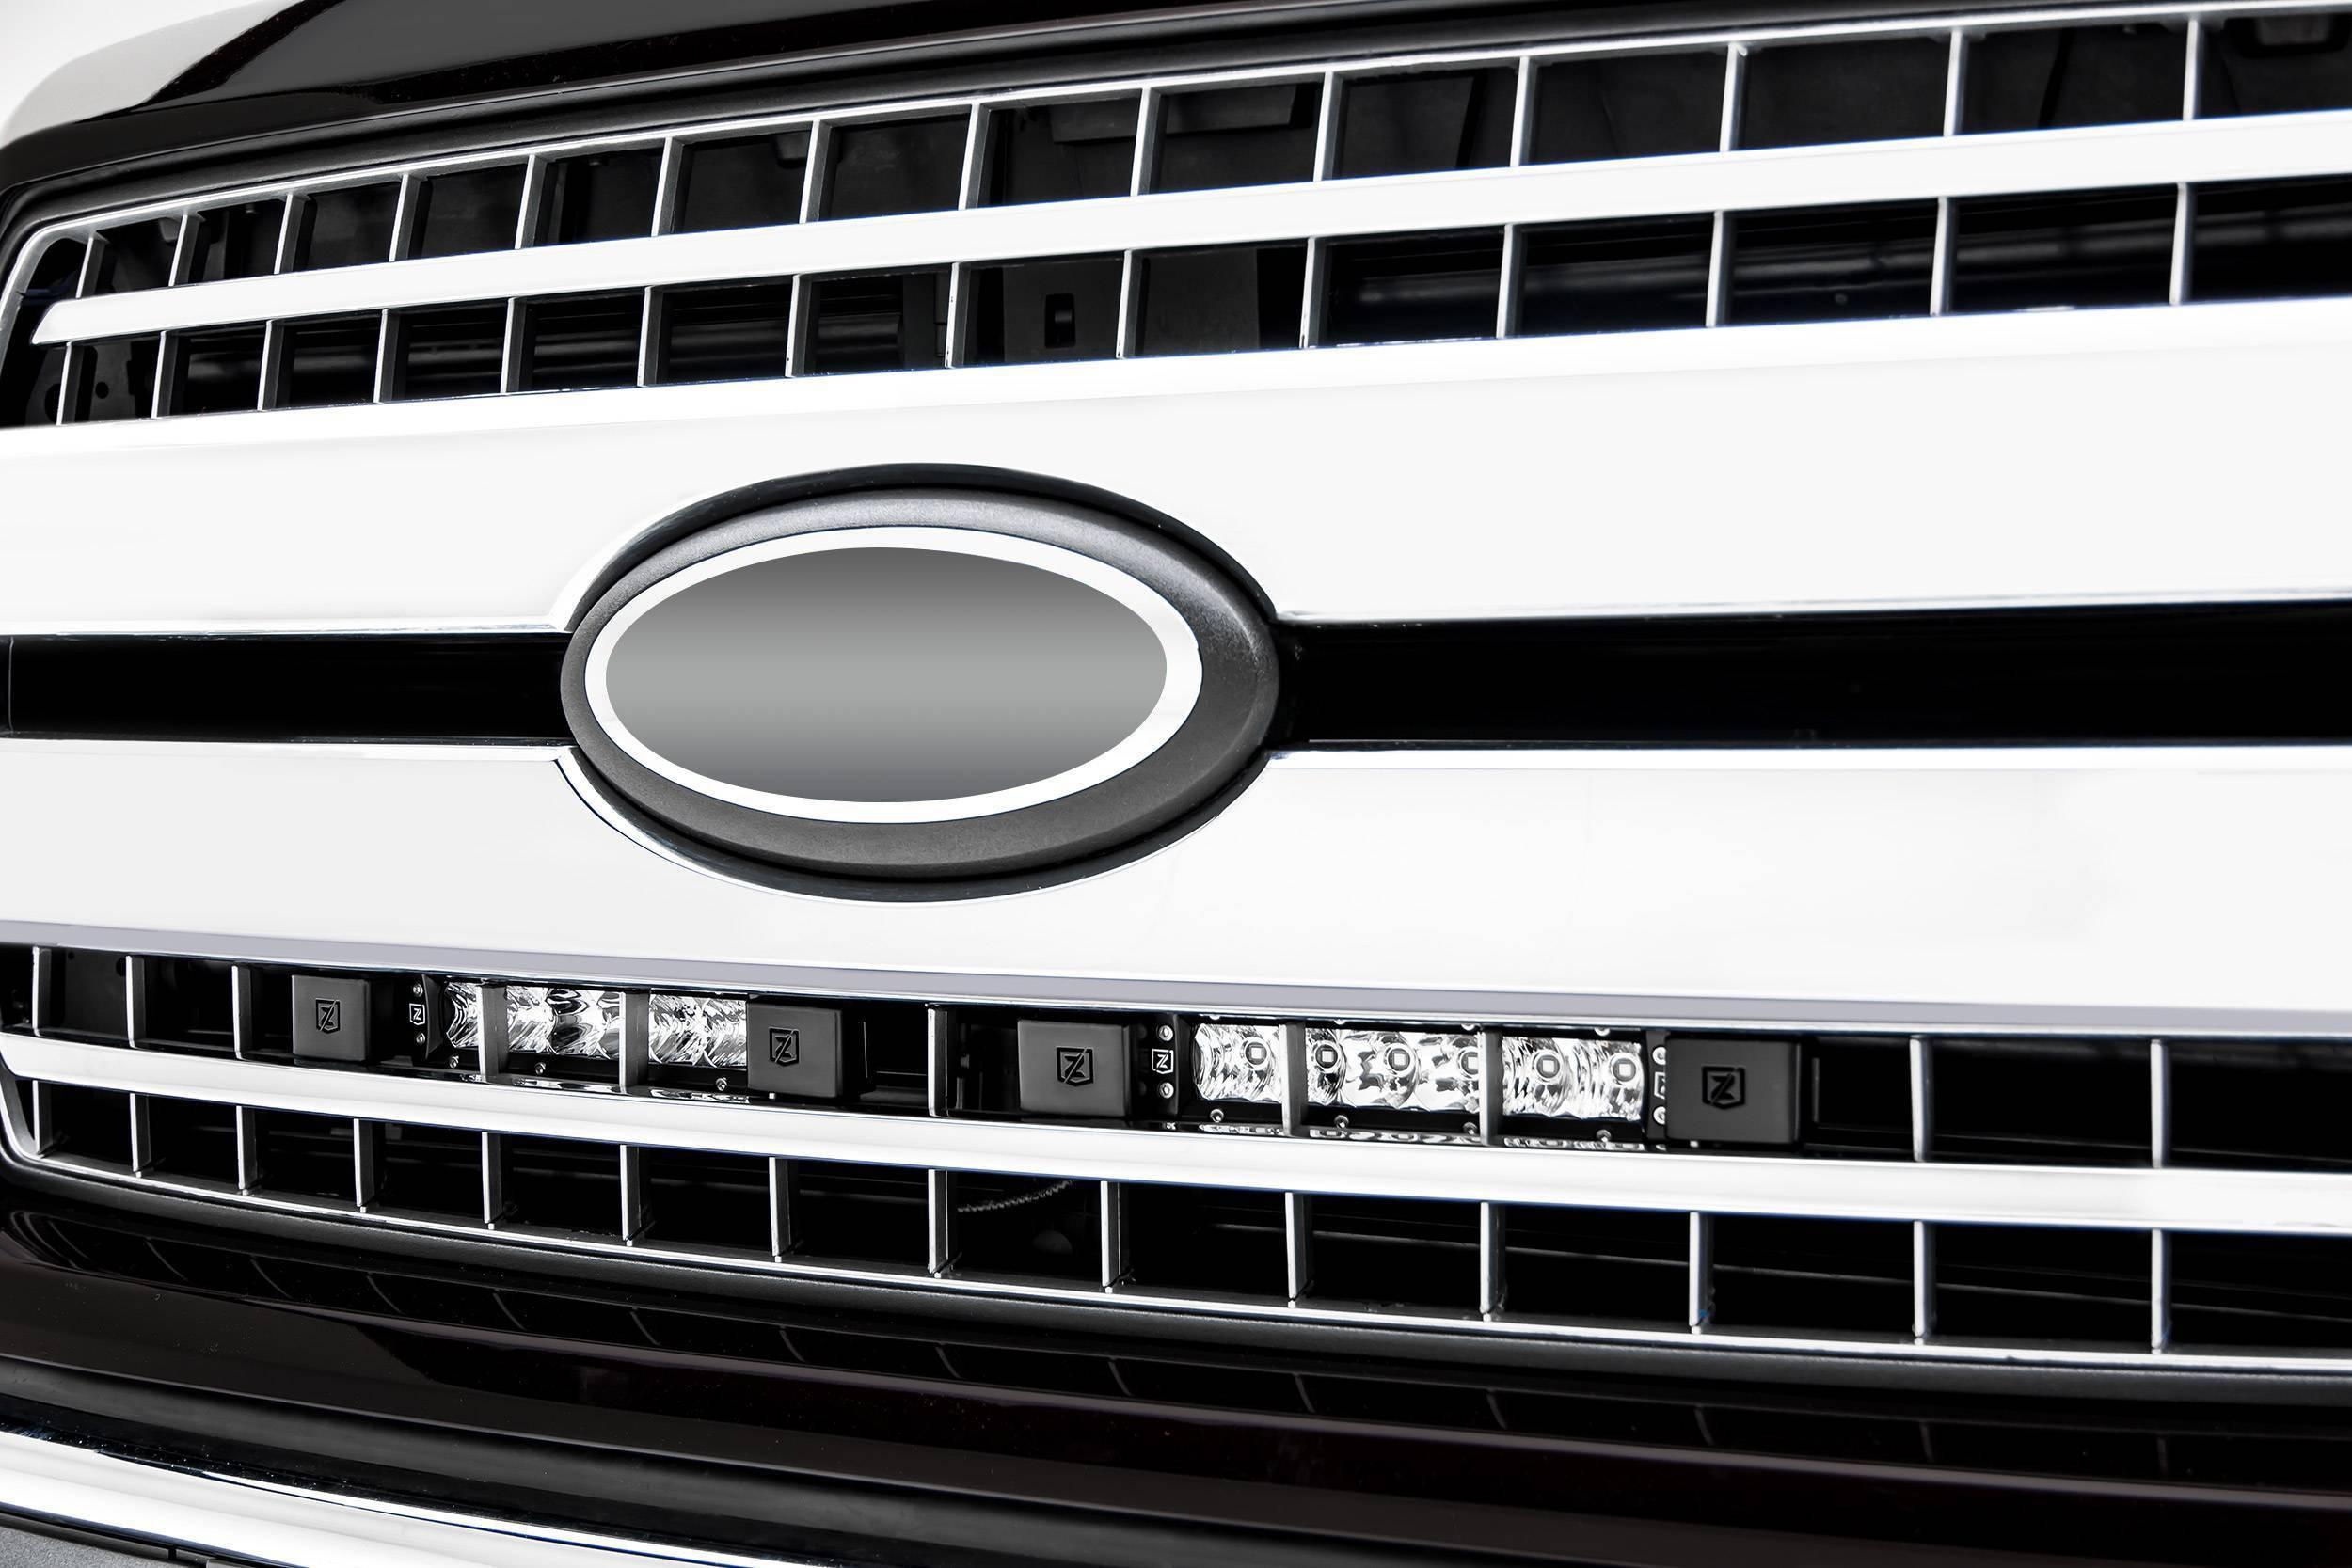 2018-2020 Ford F-150 XLT, Lariat OEM Grille LED Kit with (2) 6 Inch LED Straight Single Row Slim Lig